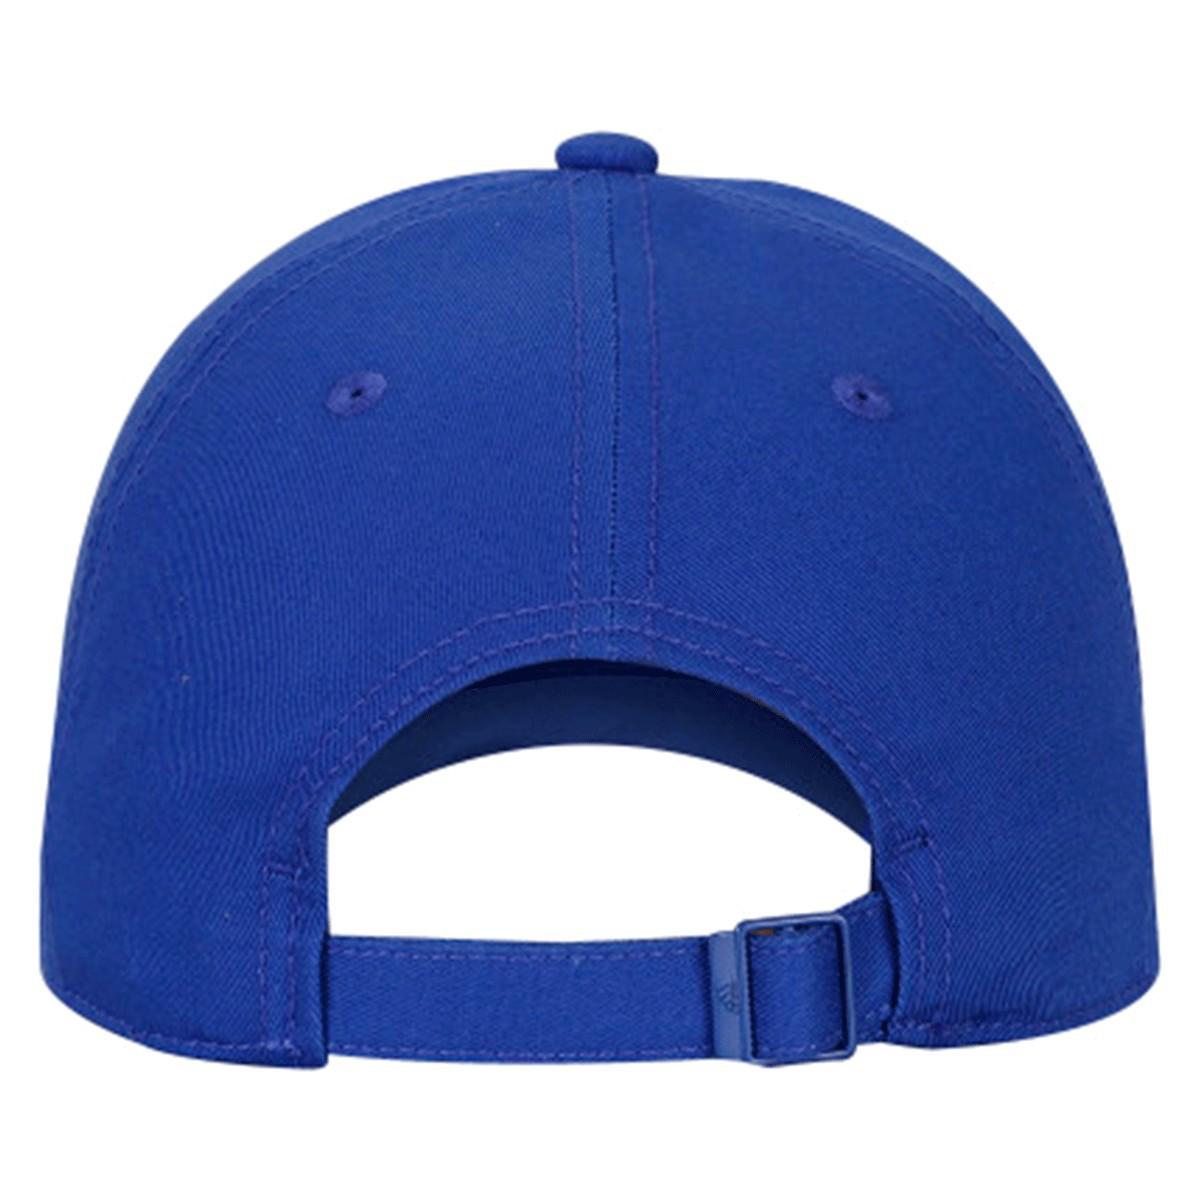 Boné Aba Curva adidas Tiro C40 Masculino - Azul